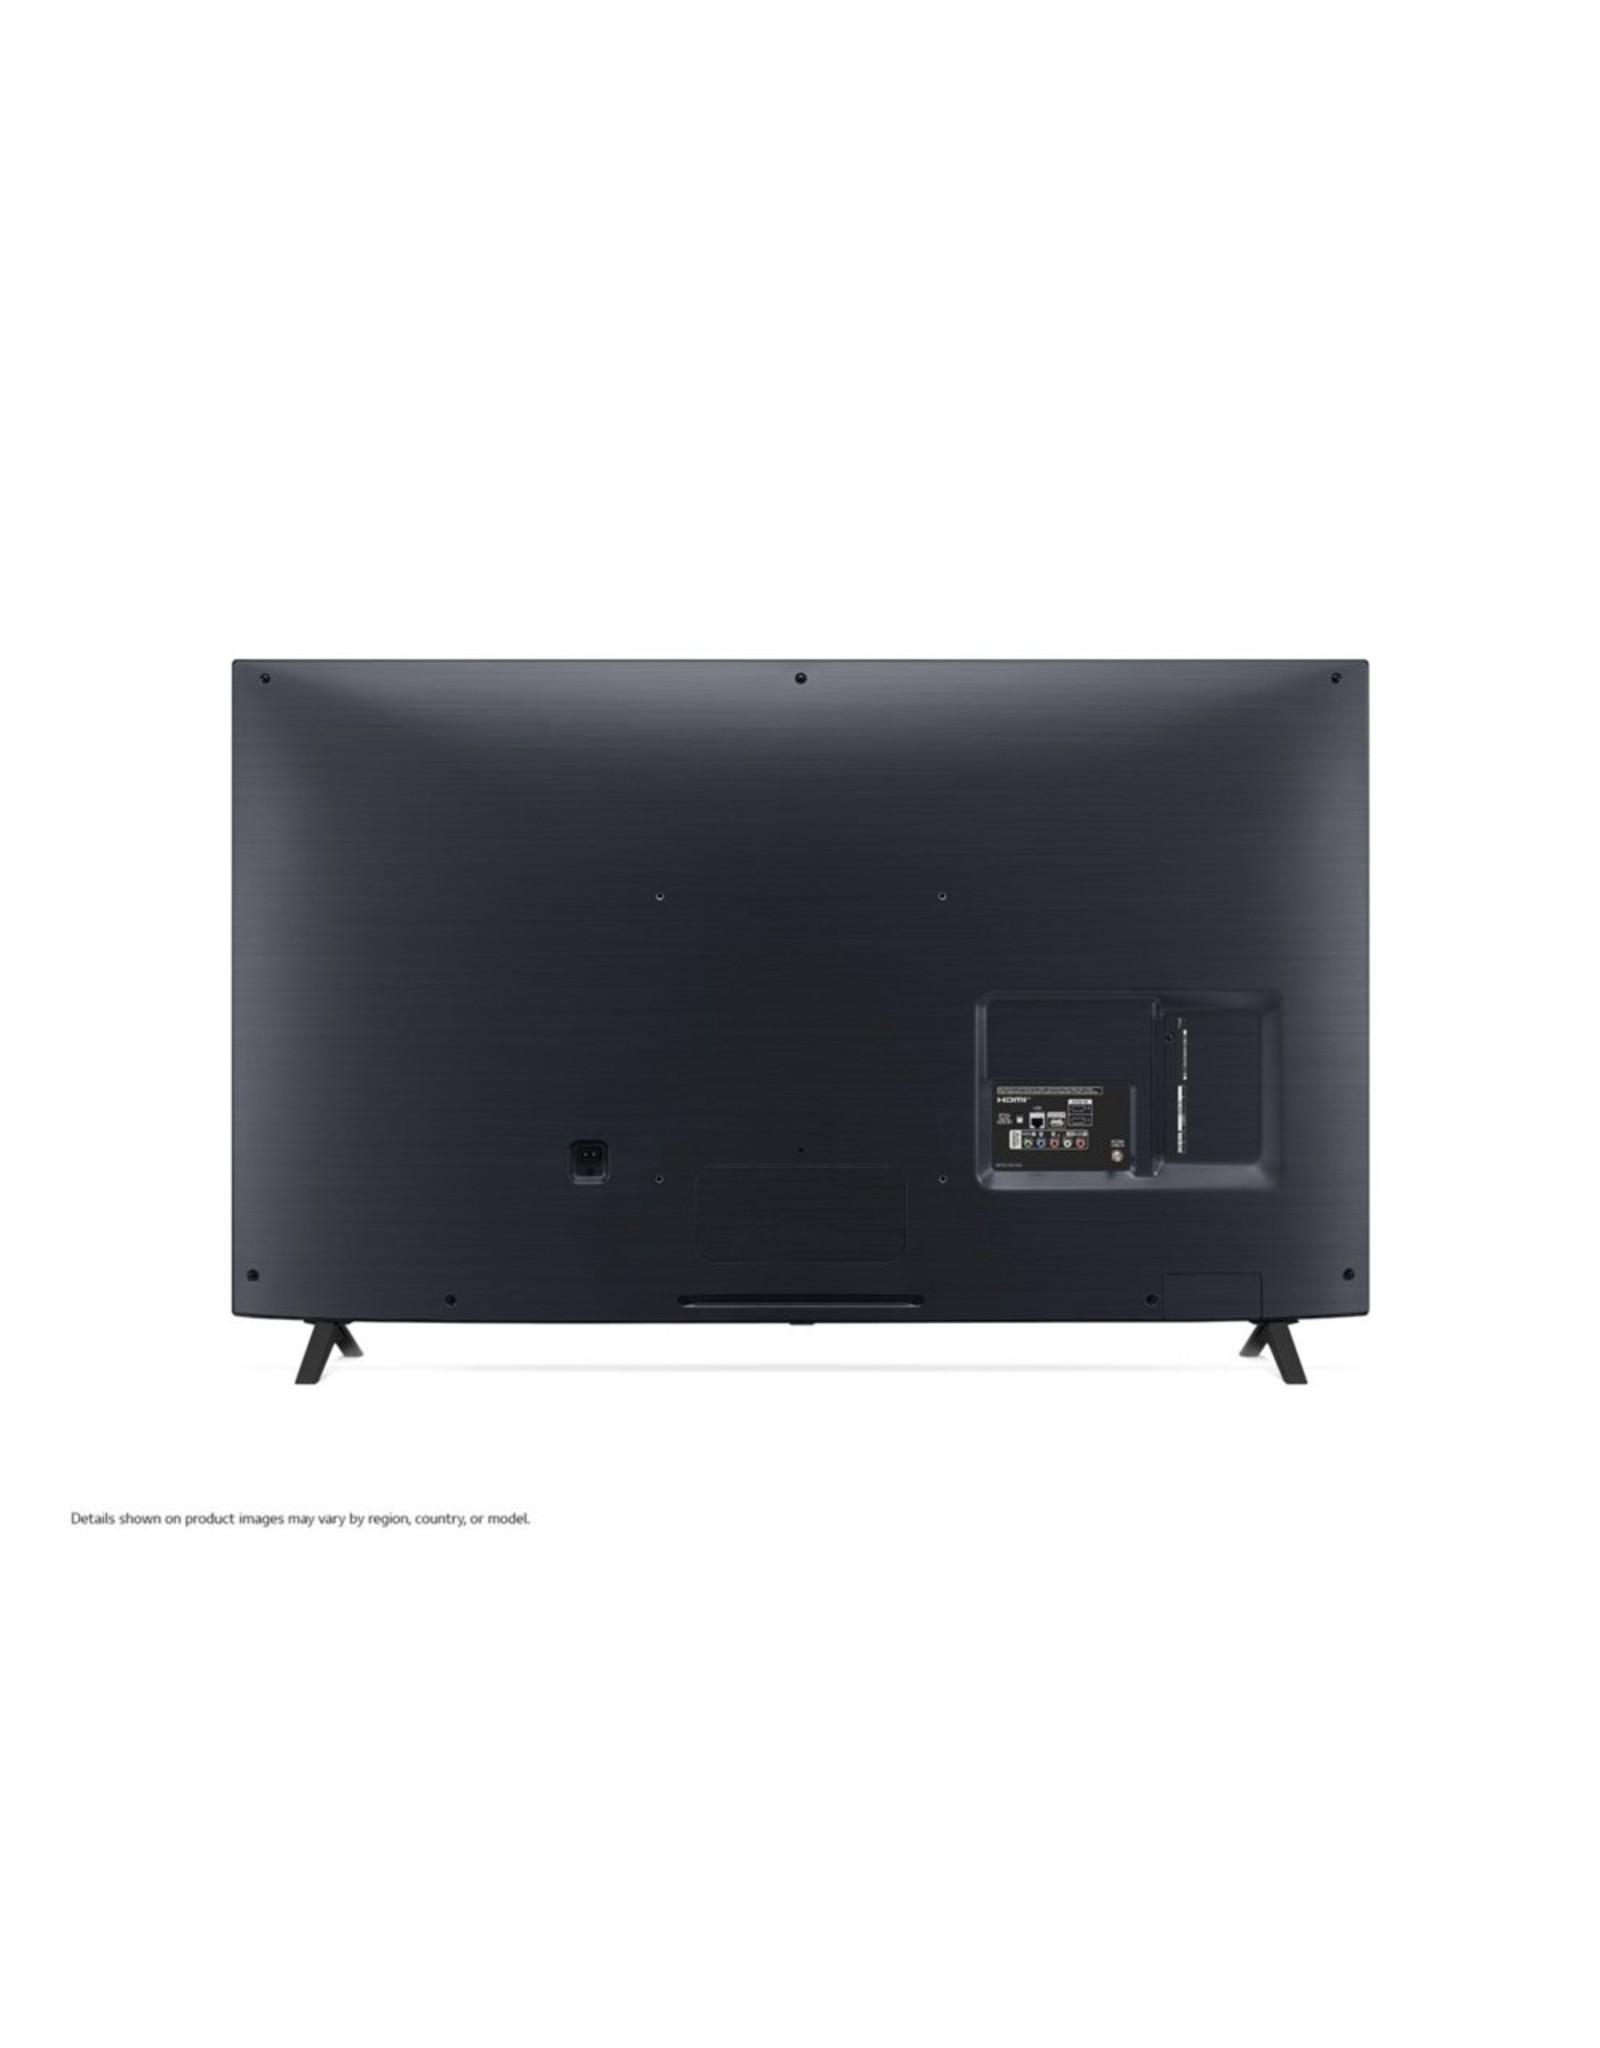 Samsung LG NanoCell 124,5cm 49inch 4K UltraHD Smart TV Wi-Fi